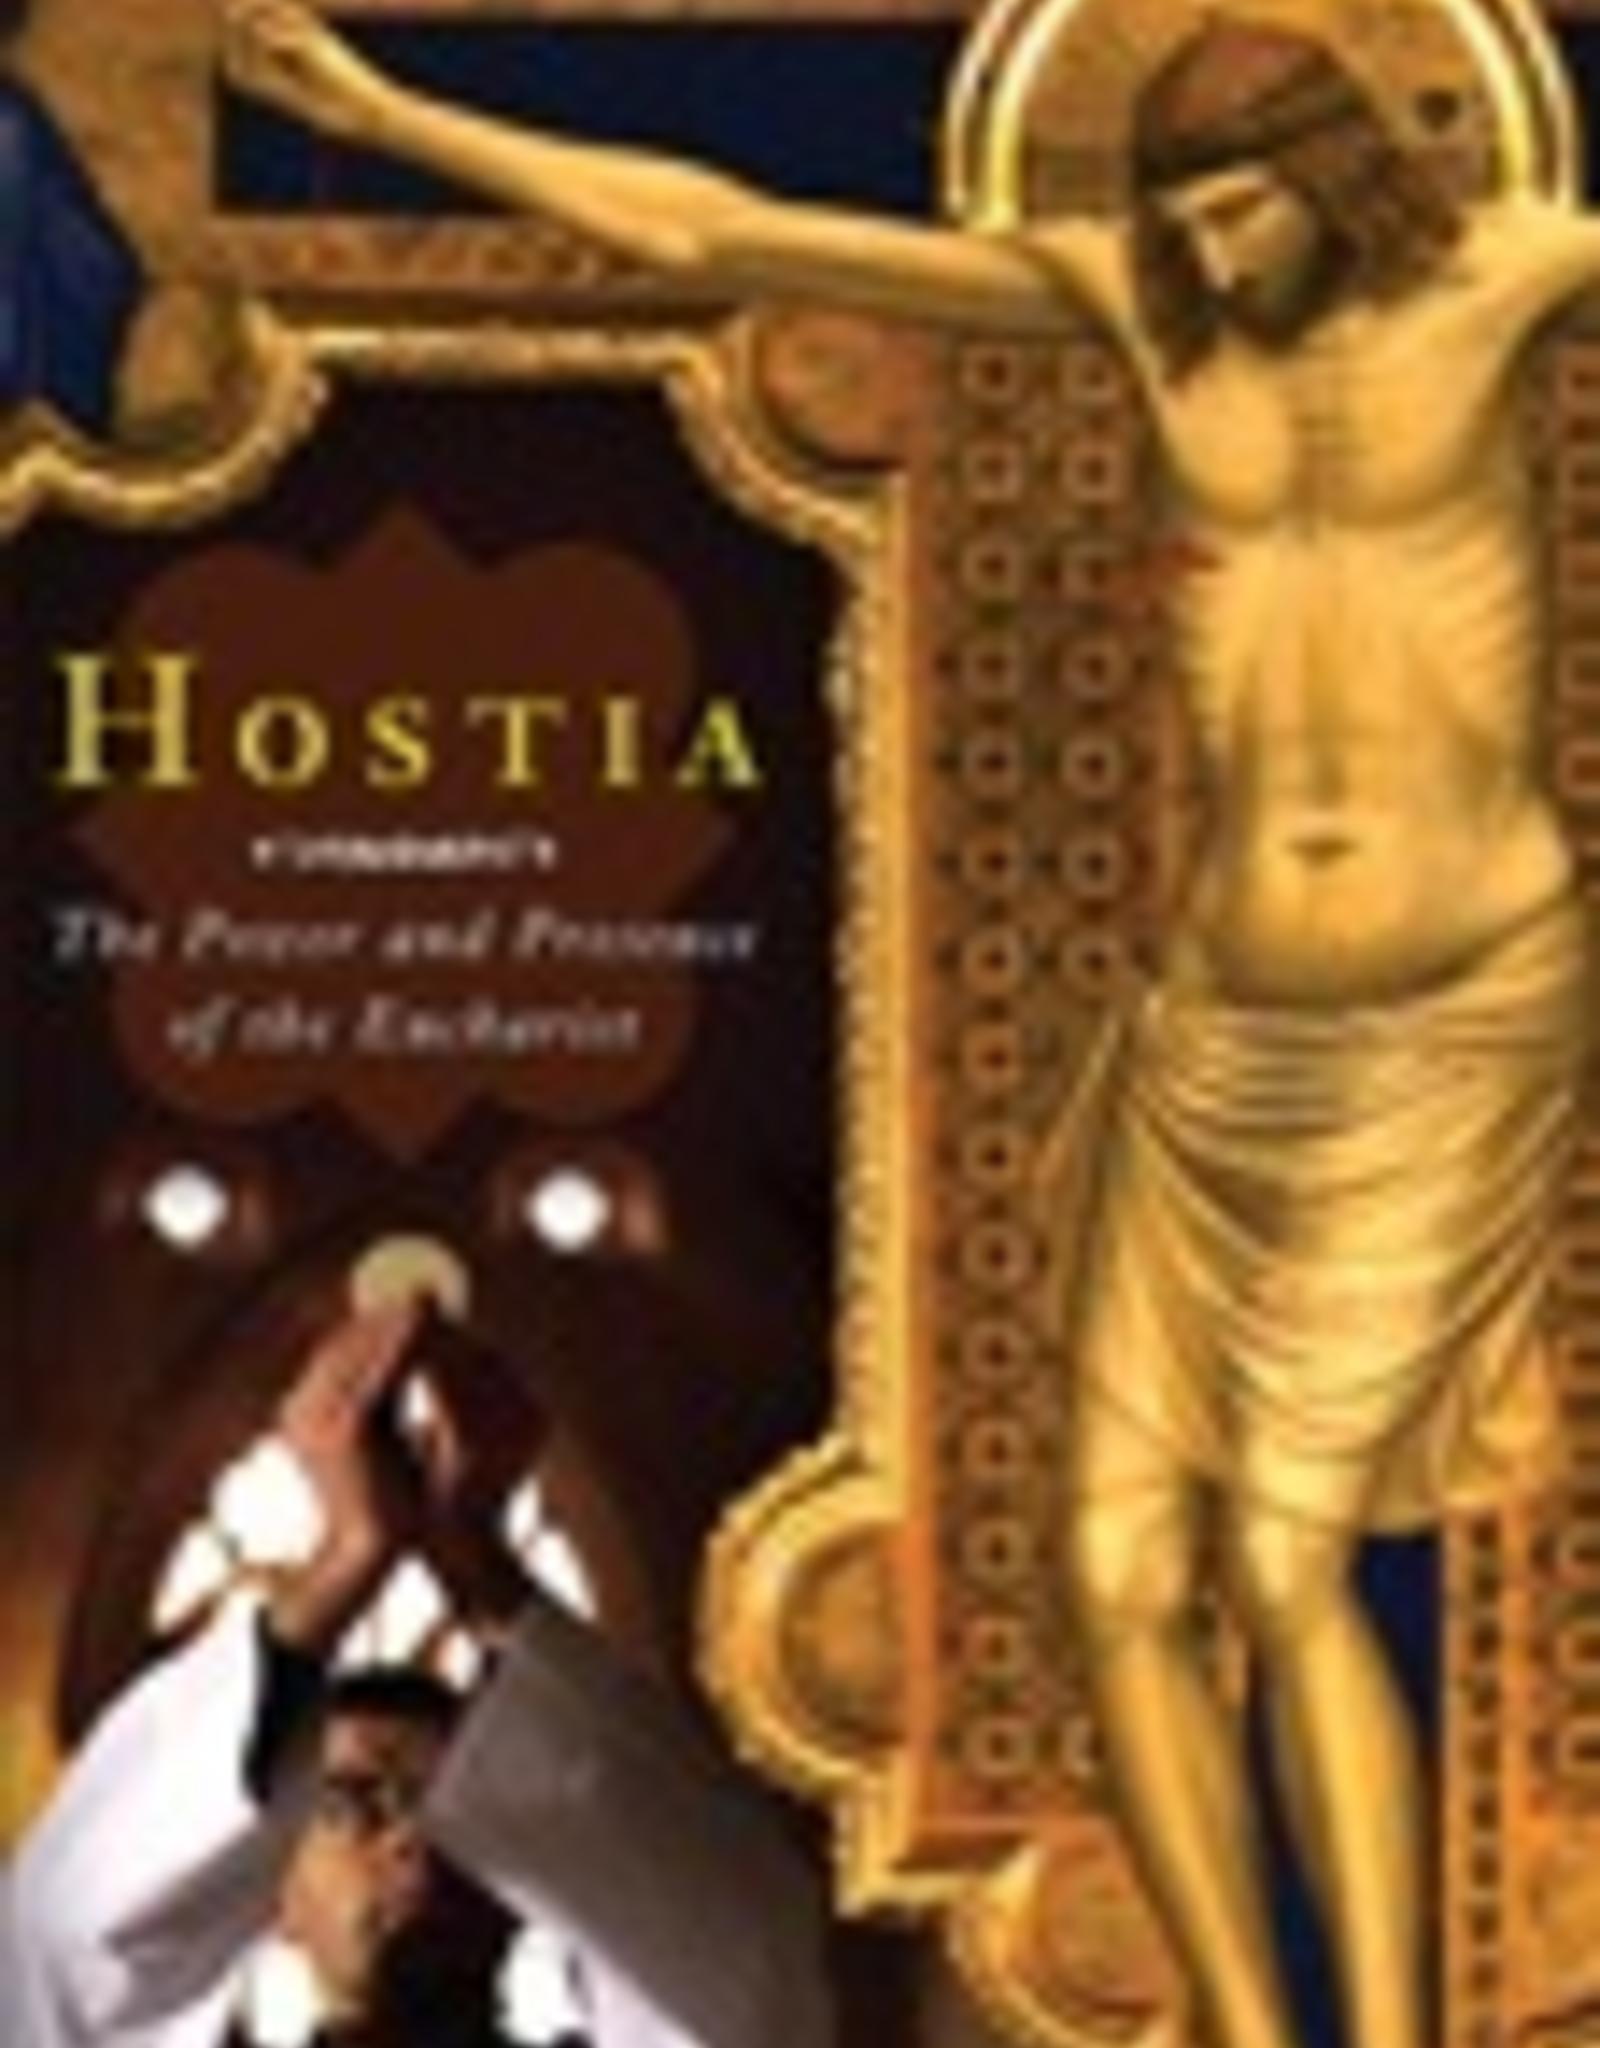 Ignatius Press Hosita:  The Power and Presence of the Eucharist (DVD)